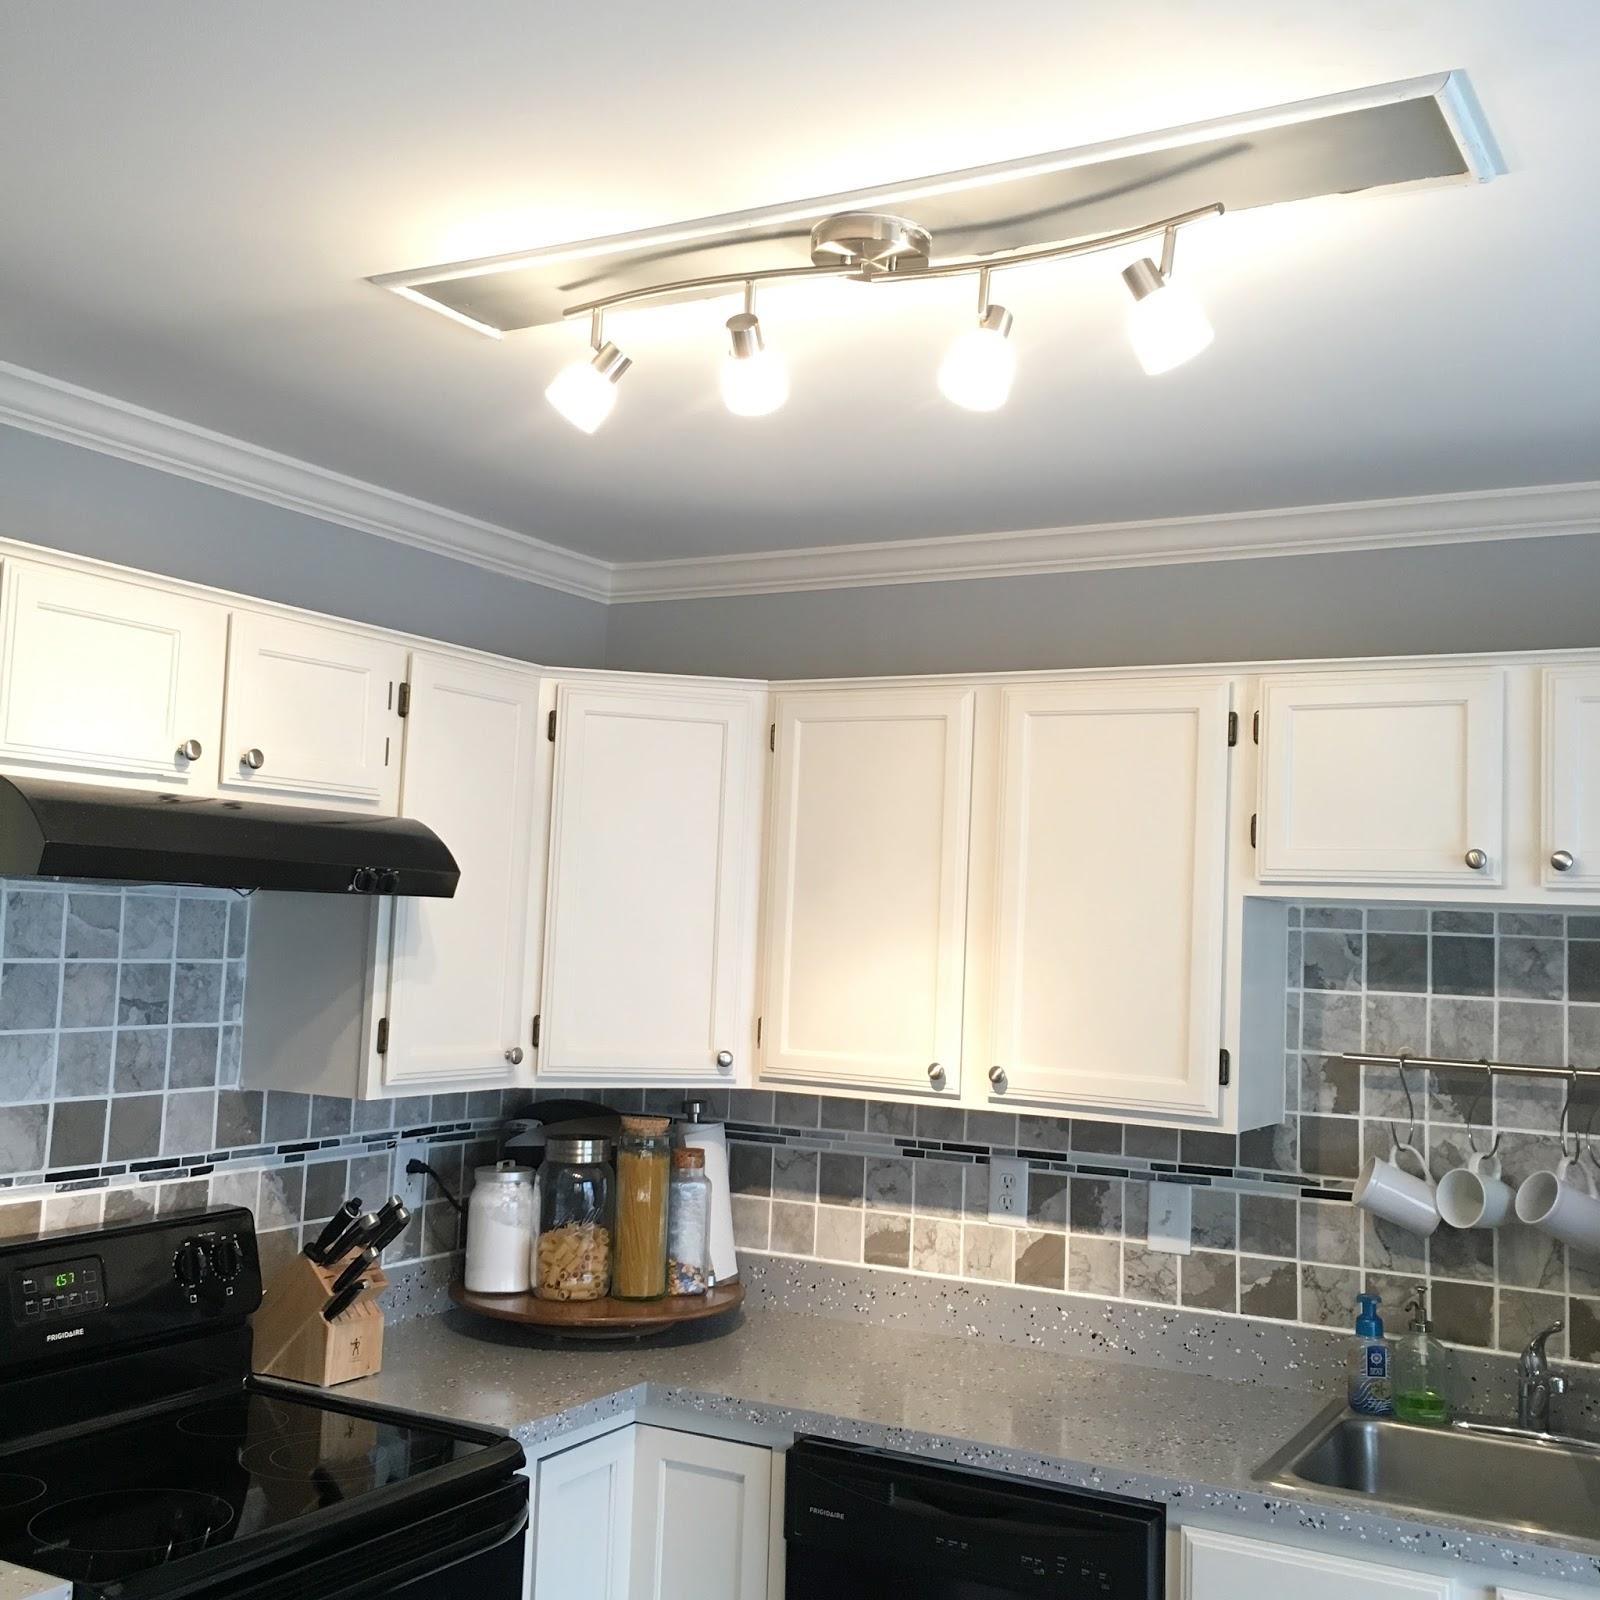 Kitchen Flooring And Backsplash: Kitchen Backsplash: Floor And Decor To The Rescue